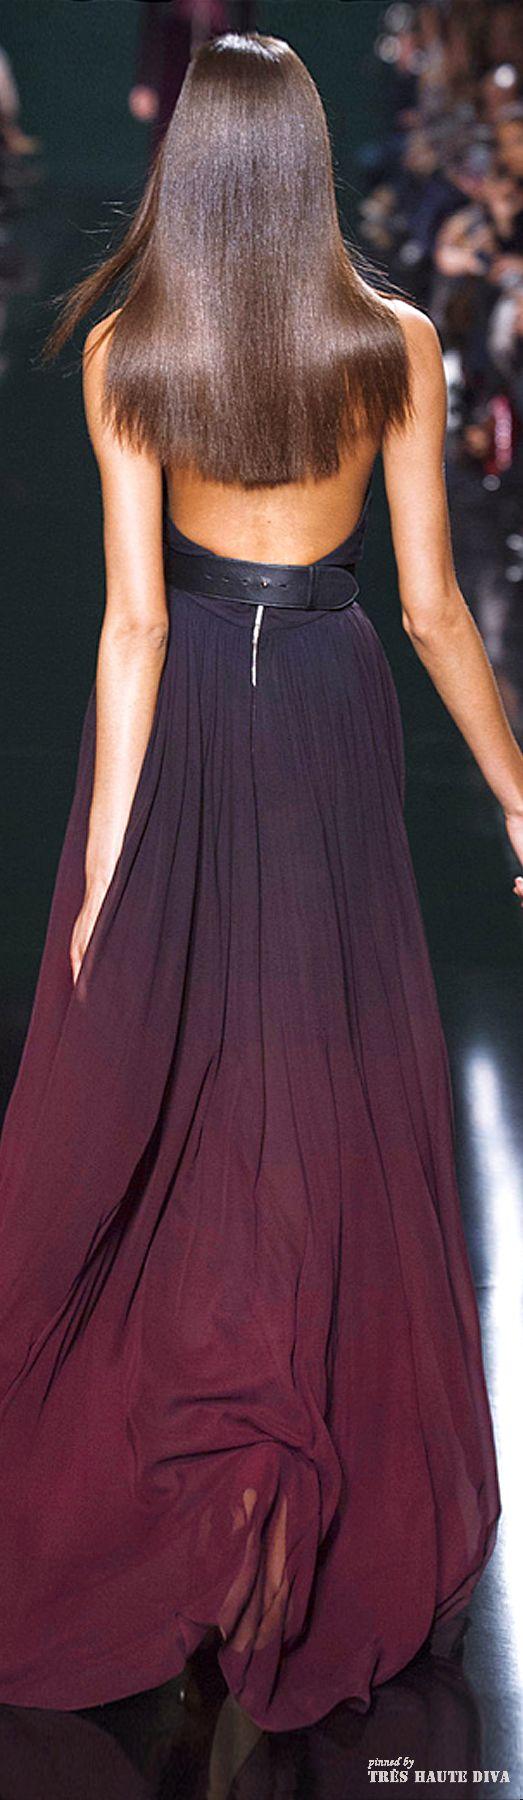 Elie Saab Fall/Winter 2014 RTW - Paris Fashion Week